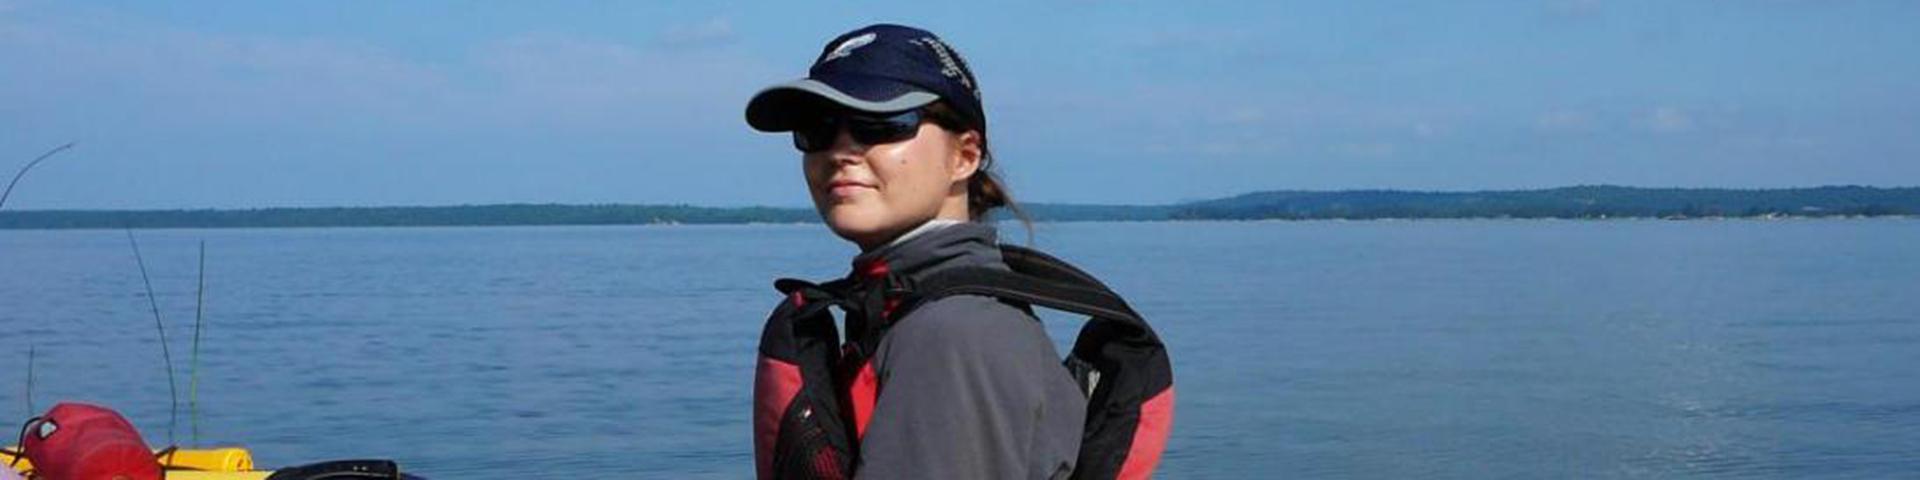 Georgian Bay Getaway Sea Kayaking Trip for Women by Black Feather - Image 167